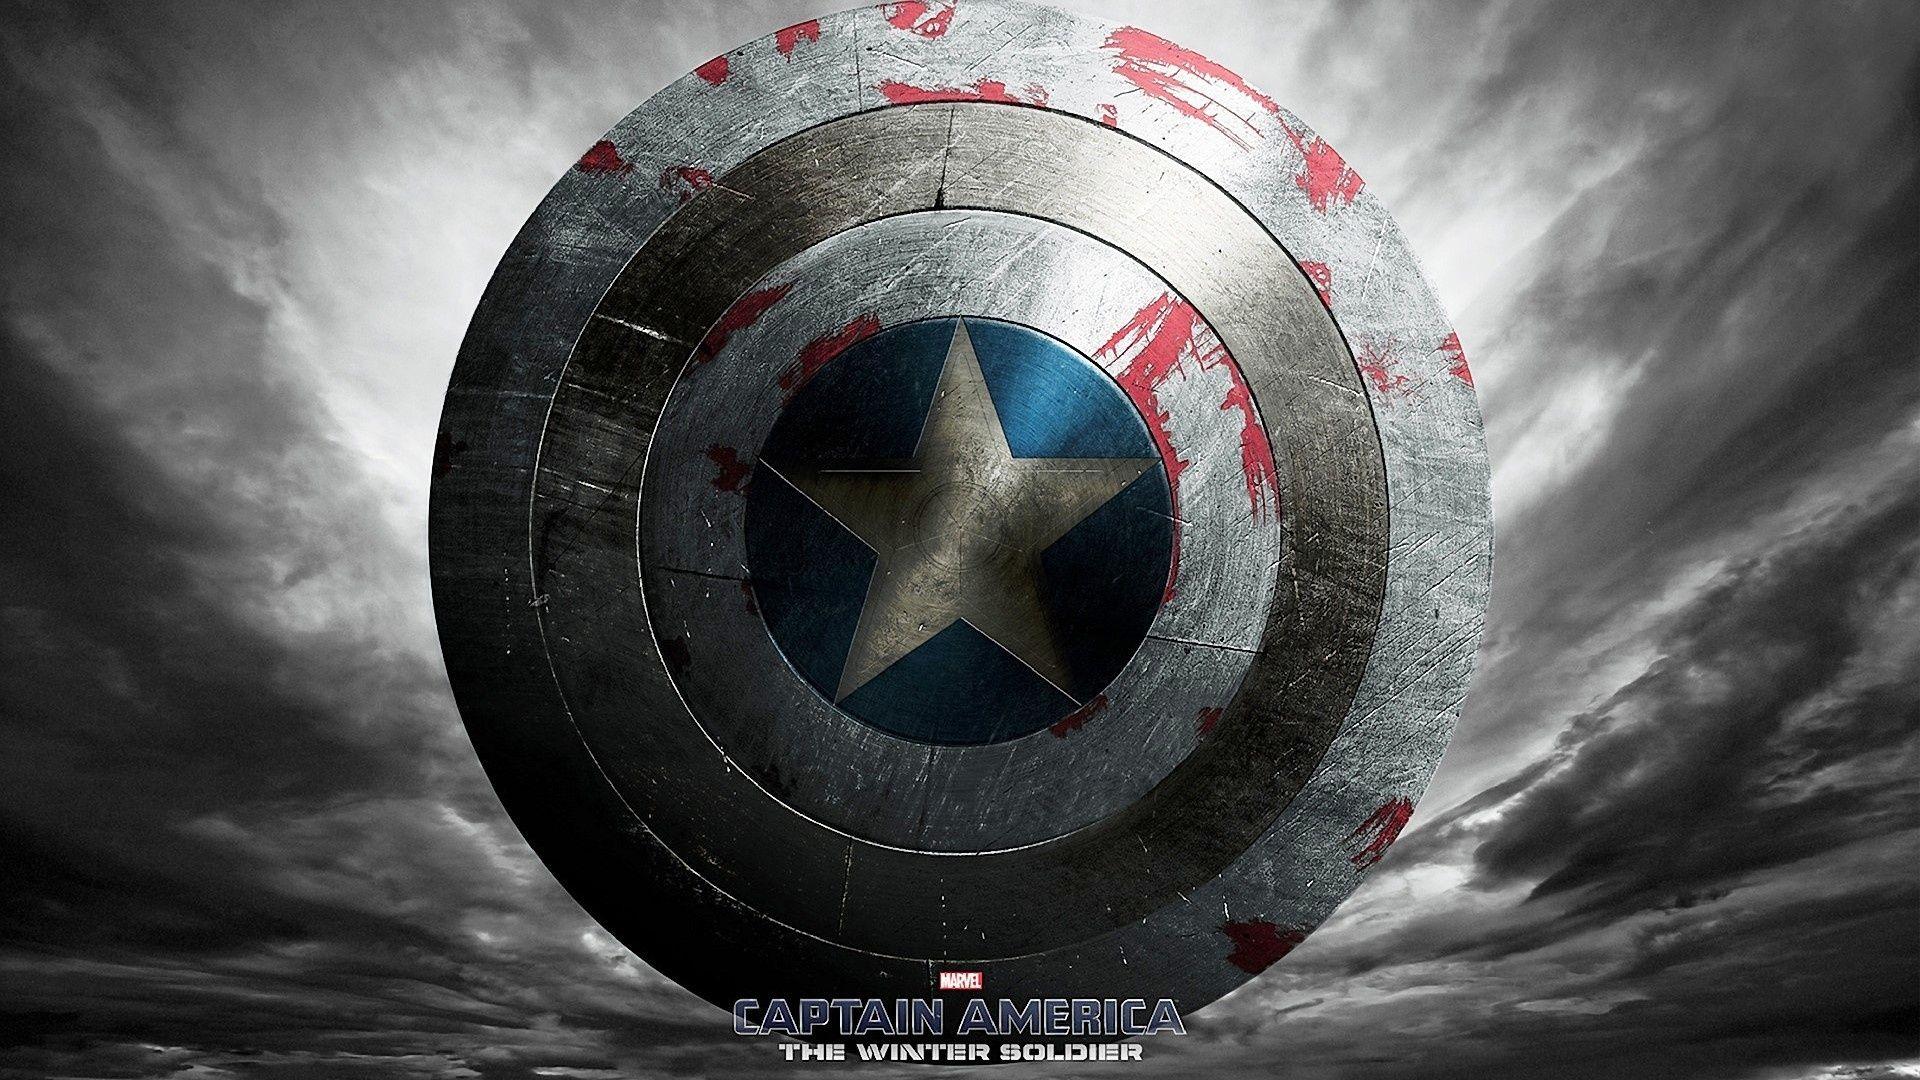 Hd wallpaper of captain america - Captain America Galaxy S Wallpaper 1920 1080 Captain America Wallpaper Hd 30 Wallpapers